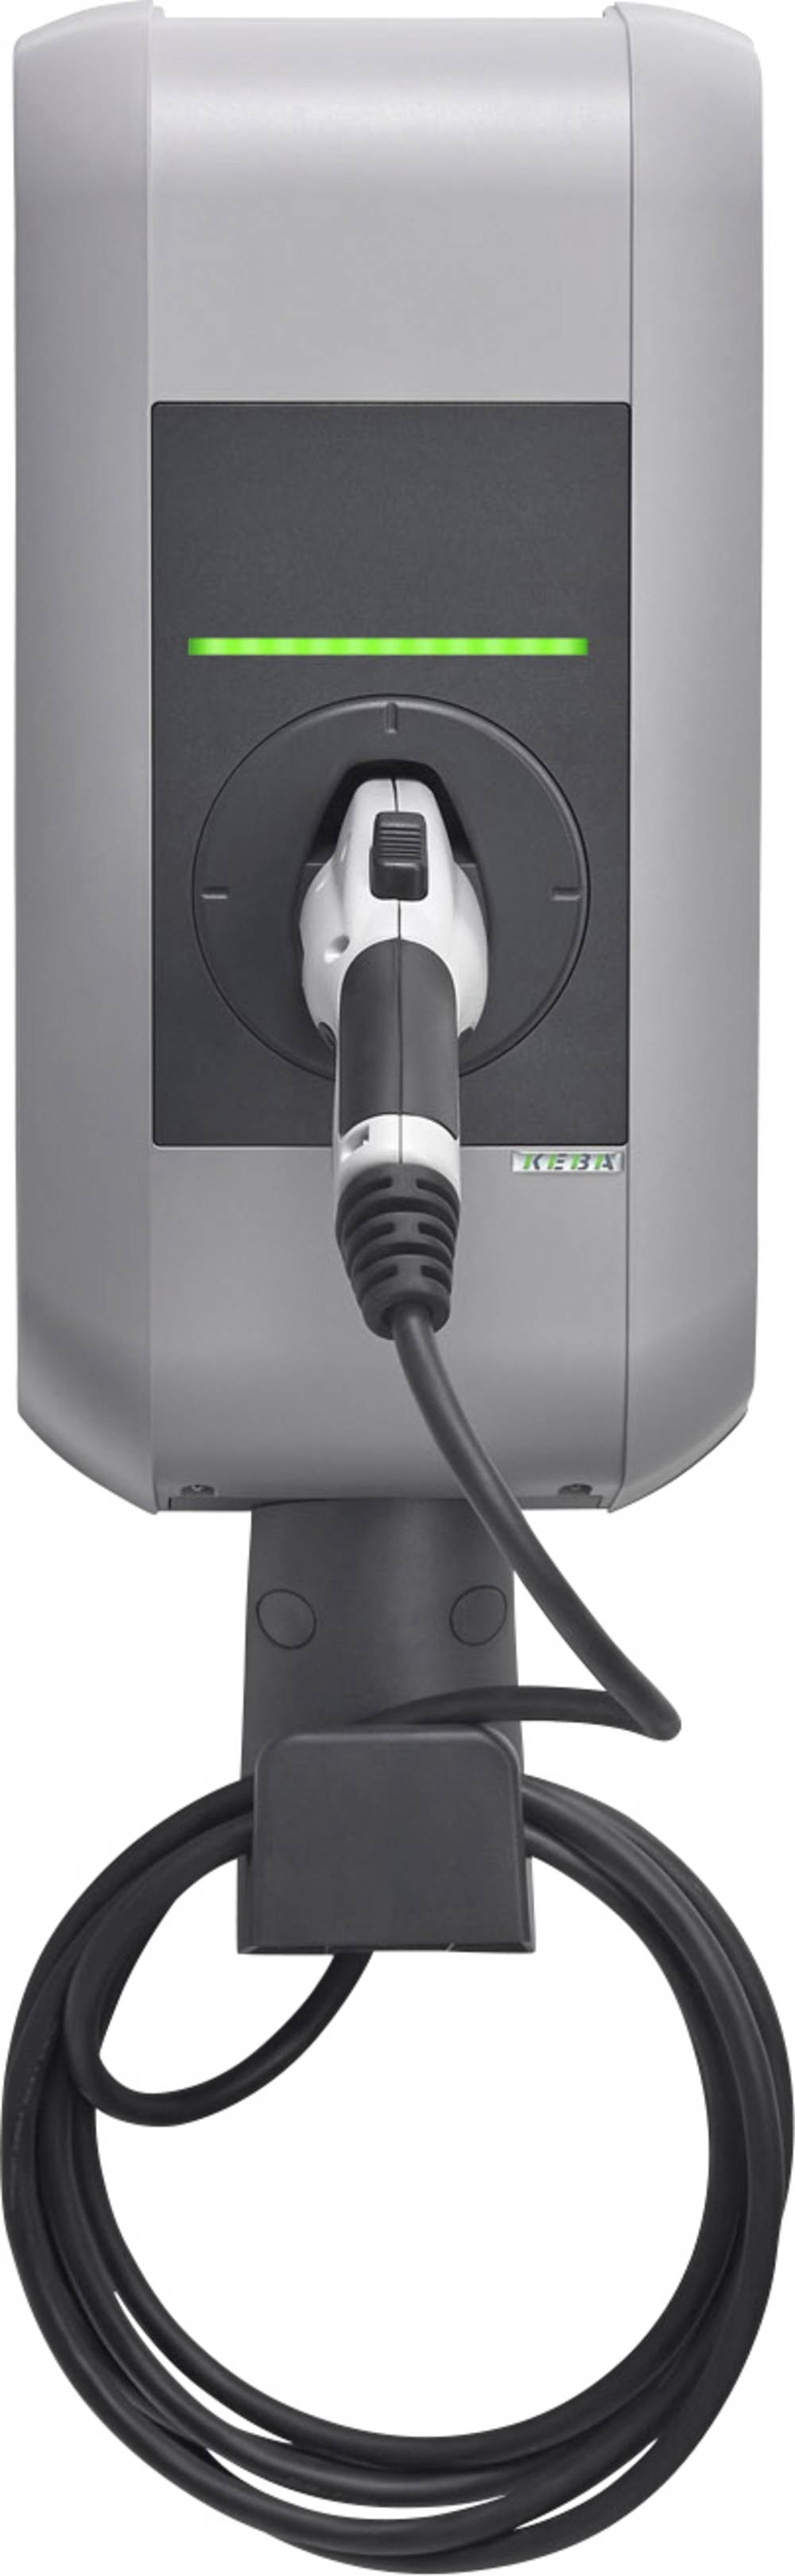 eMobility ladestation KEBA KeContact P30 Type 1 Mode 3 20 A 4.6 kW